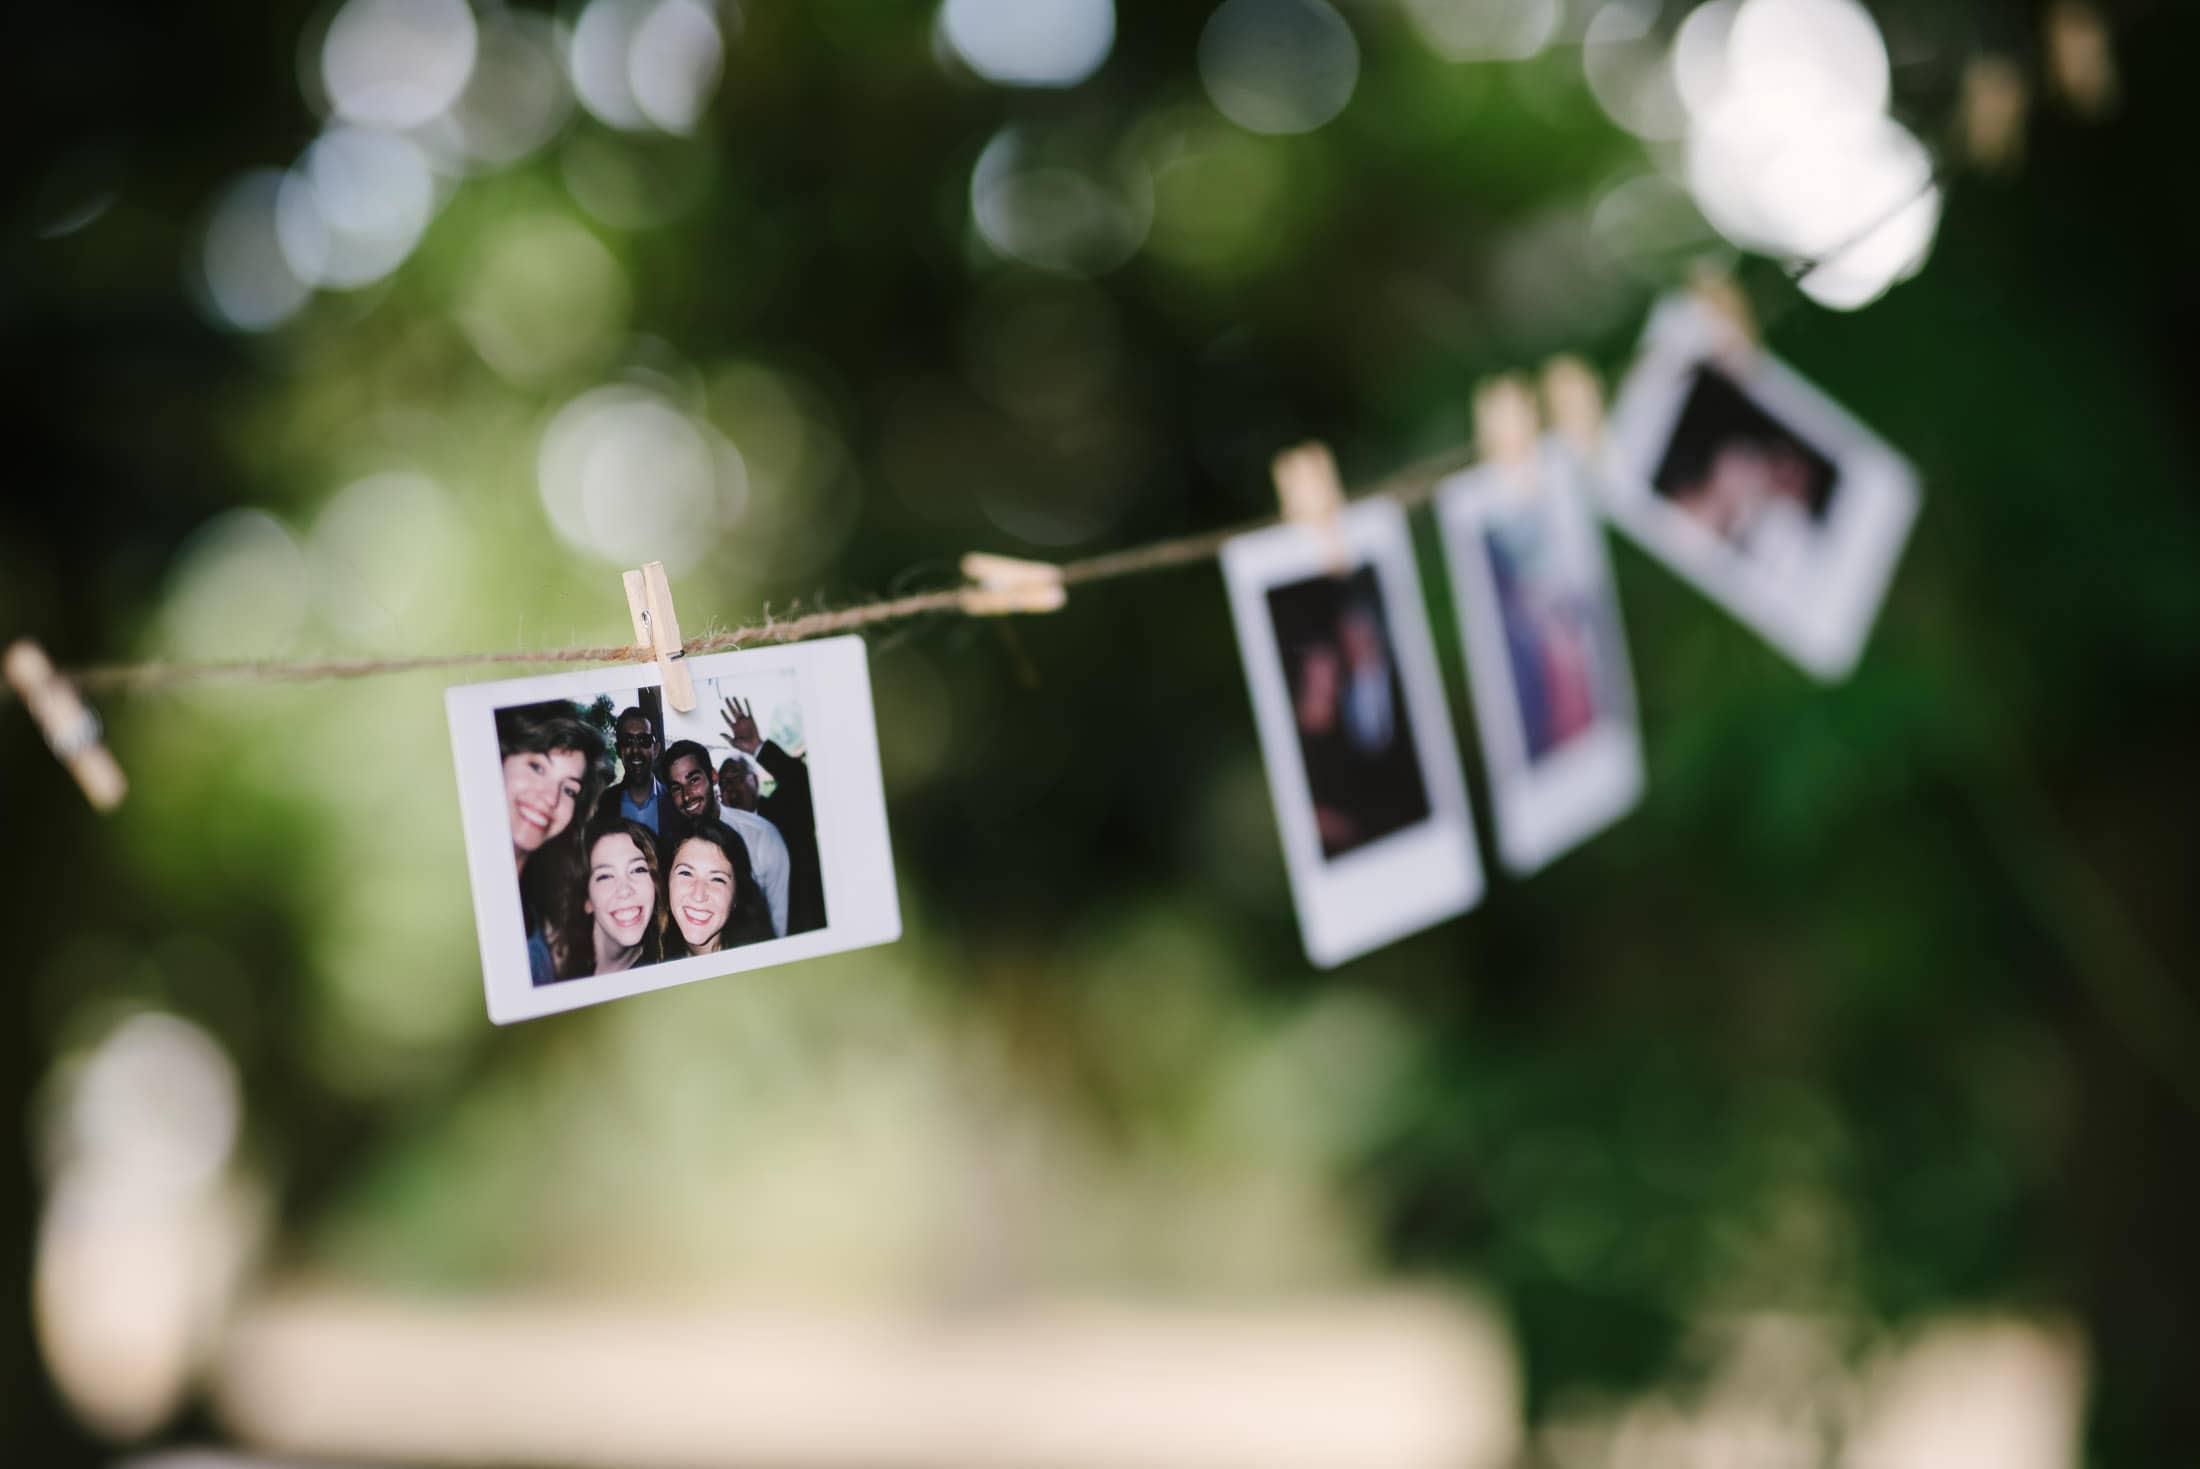 Polaroids hanging on line